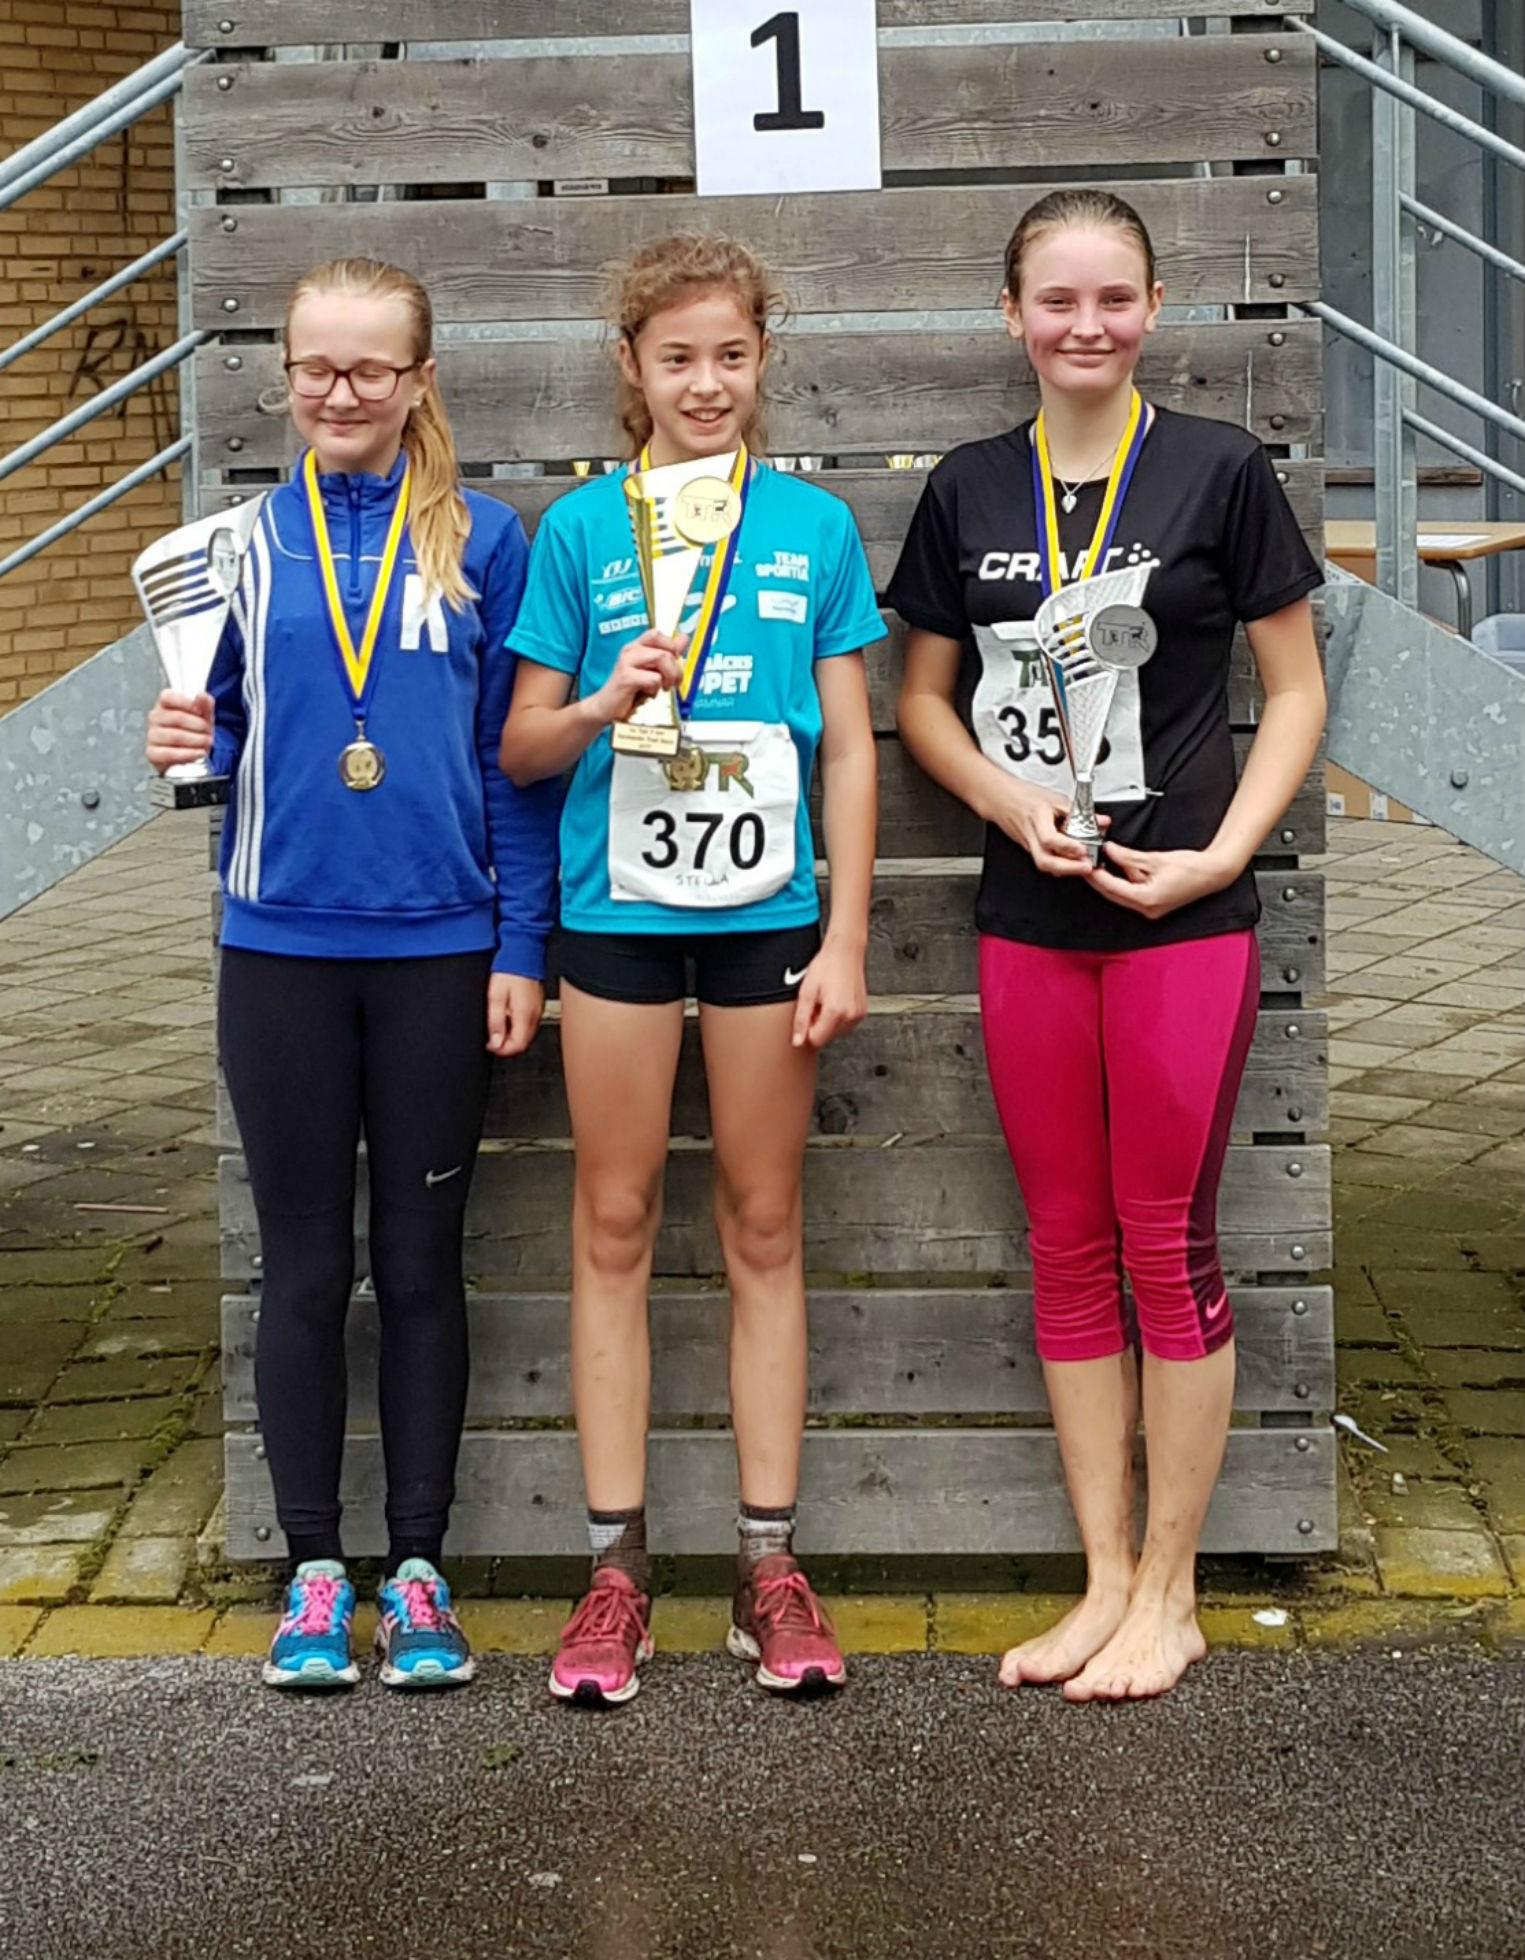 5km Flickor: 1:a Stella Buer Levy, 2:a Felicia Brink, 3:a Alyssa Englund